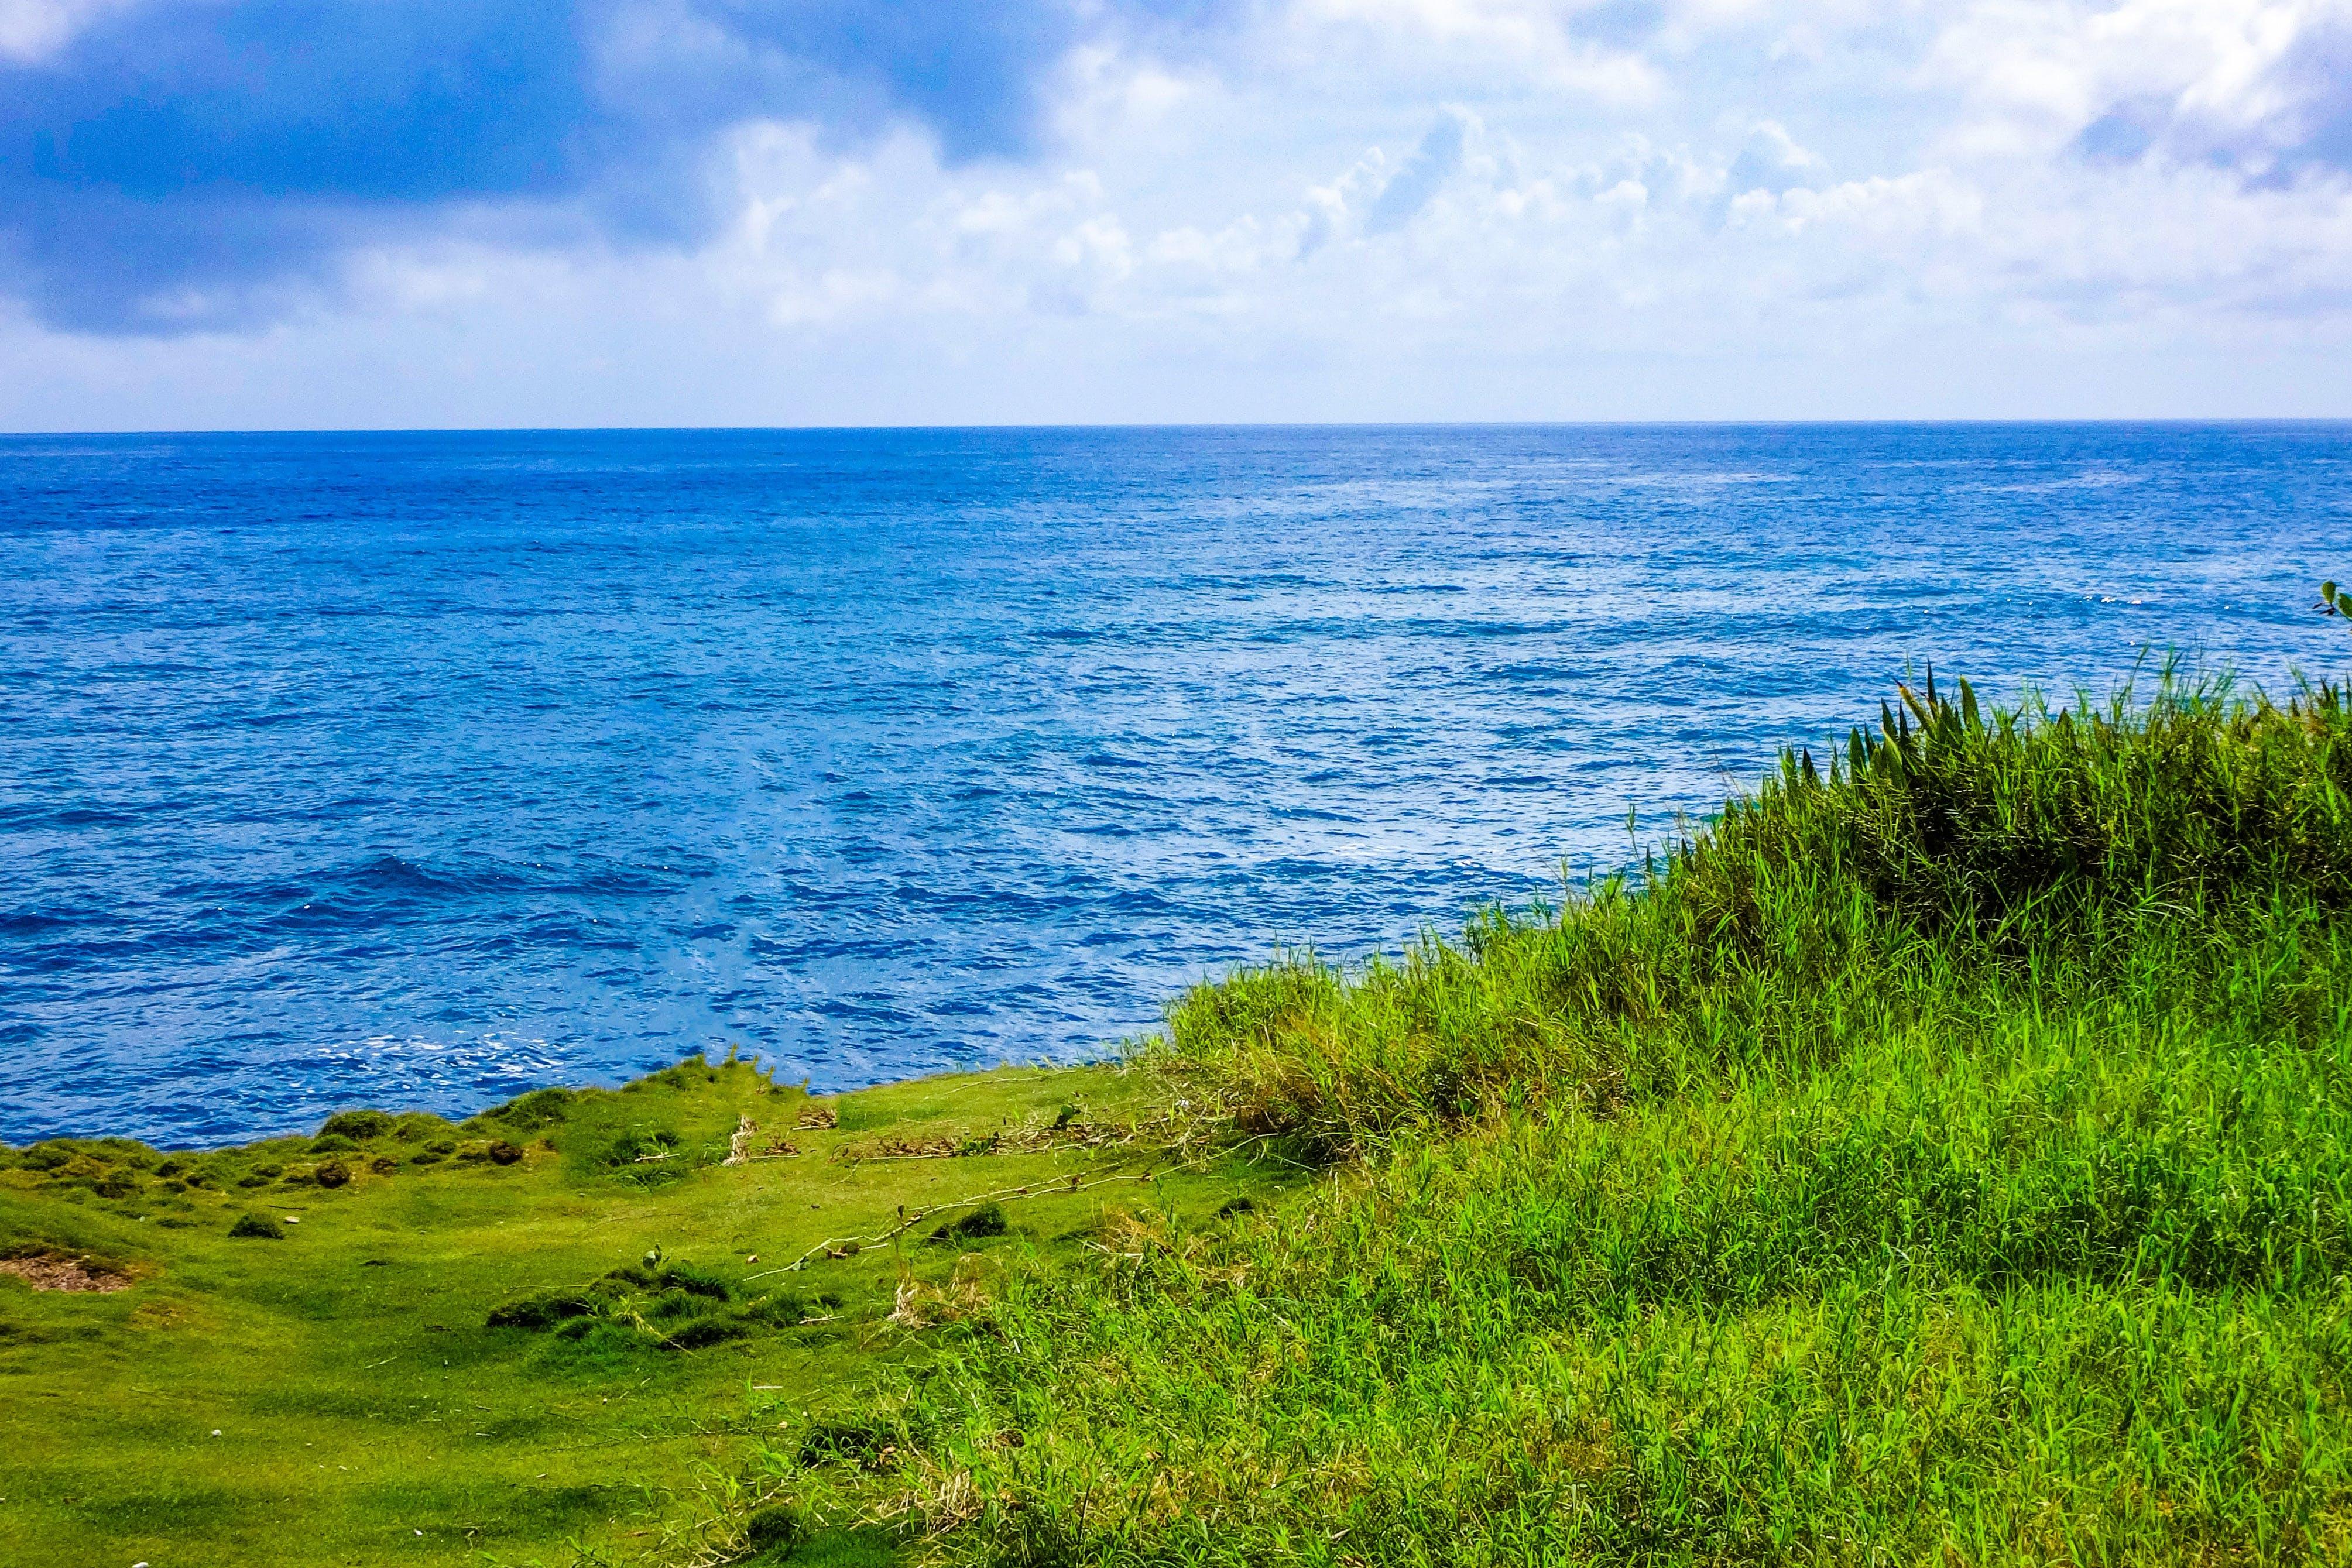 Gratis stockfoto met blikveld, daglicht, Golf, golven